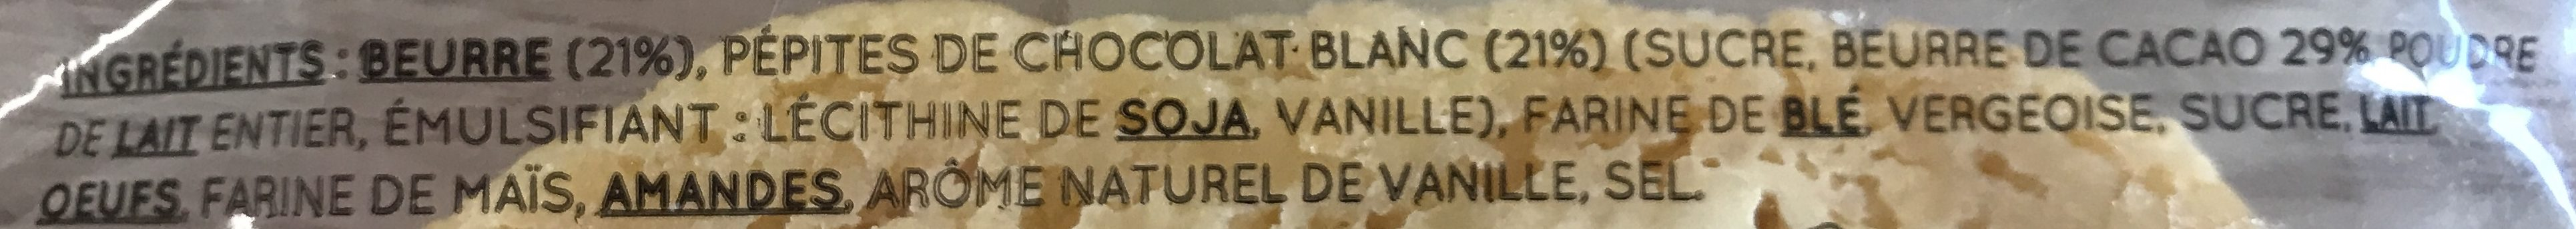 Cookie chocolat blanc - Ingrédients - fr